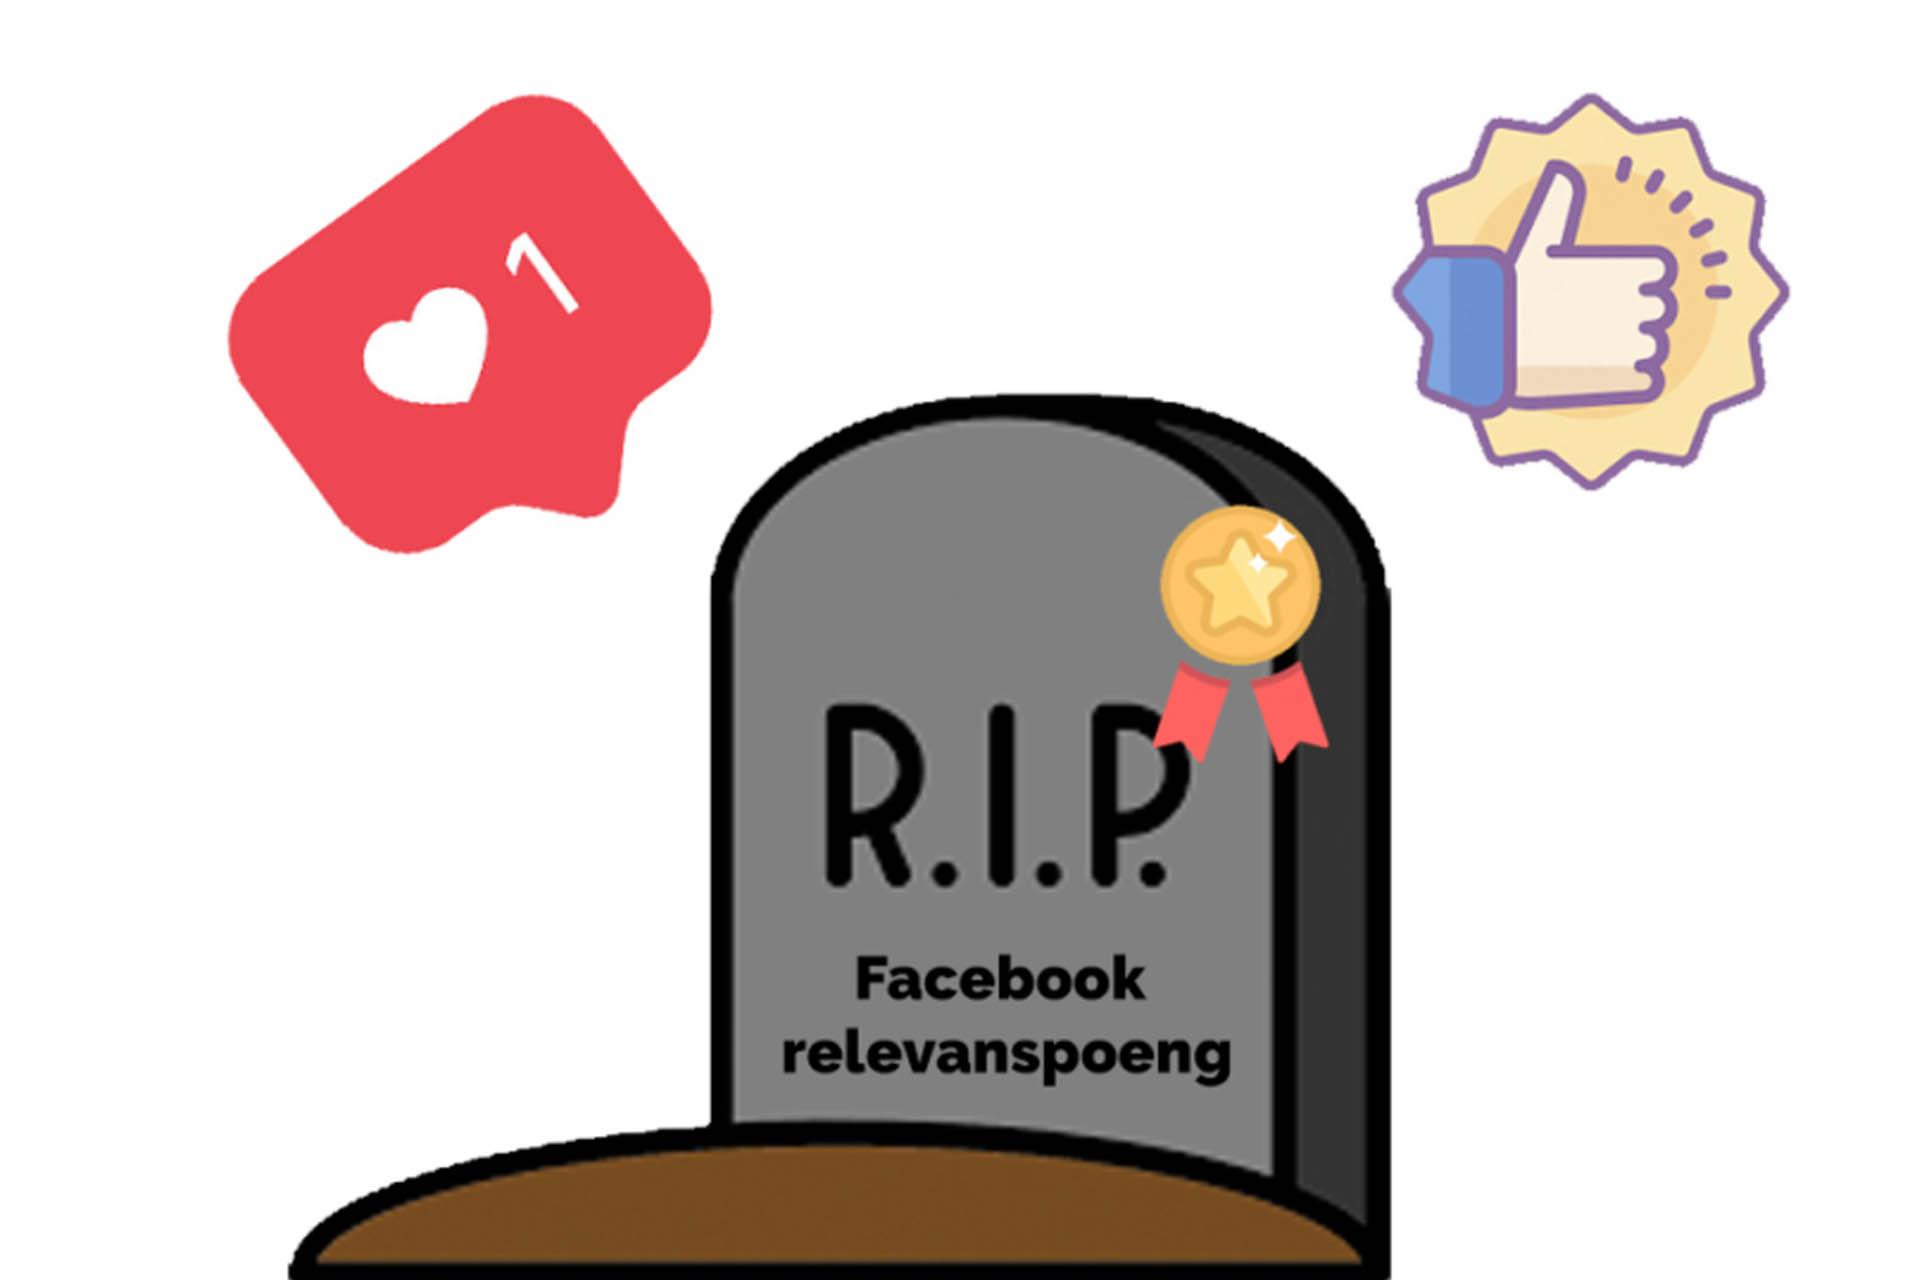 Slik mestrer du Facebook sine nye relevanspoeng